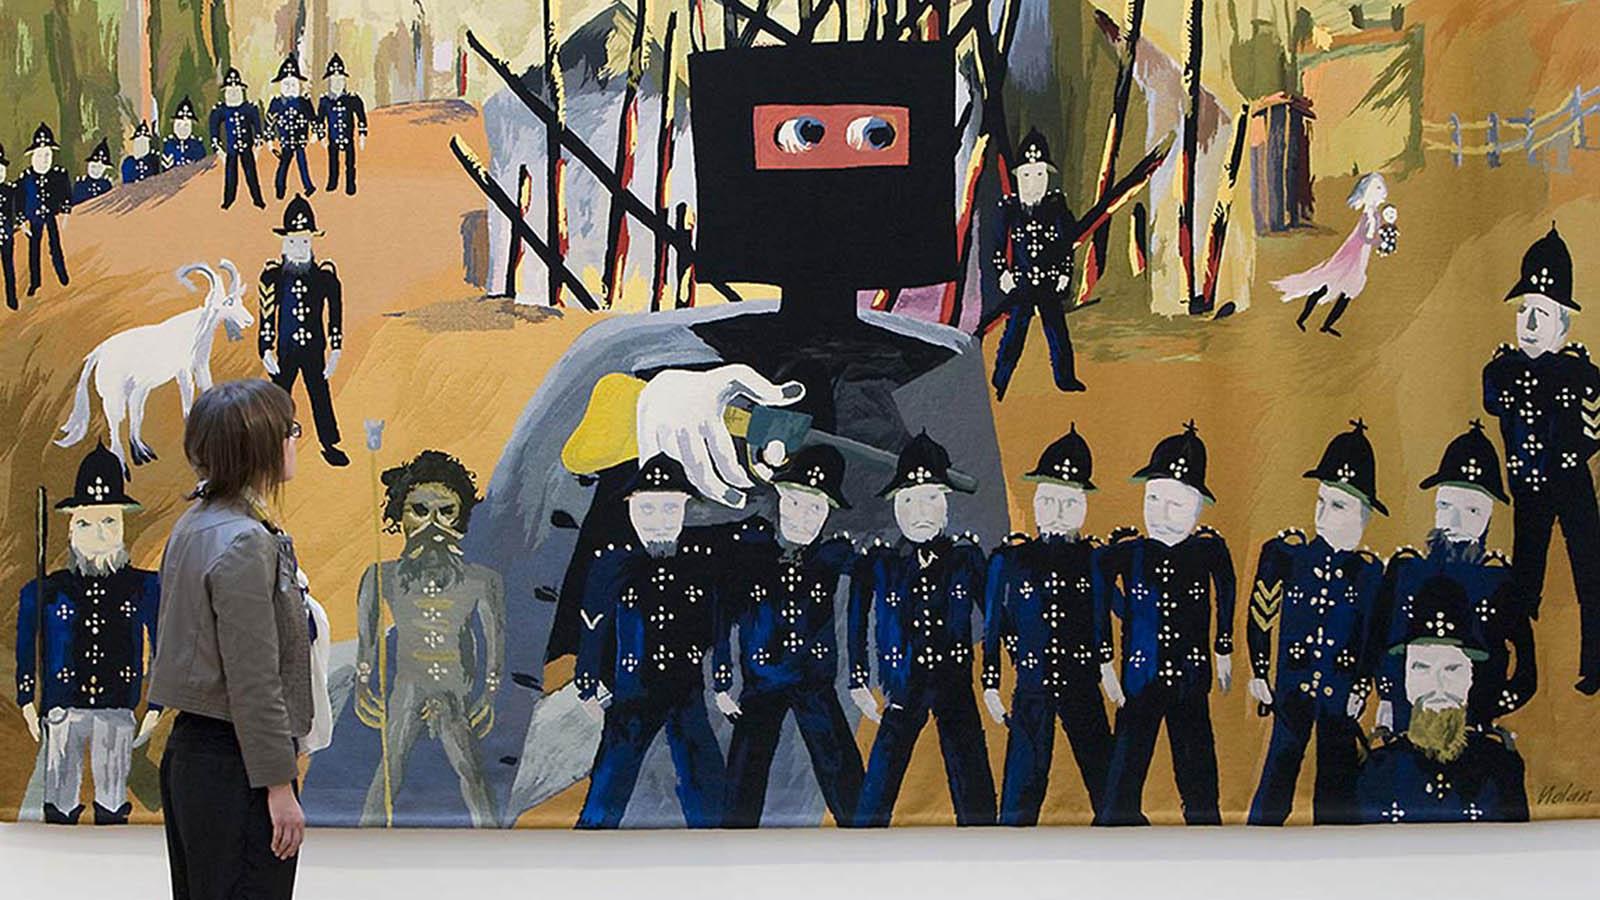 Benalla Art Gallery, High Country, Victoria, Australia